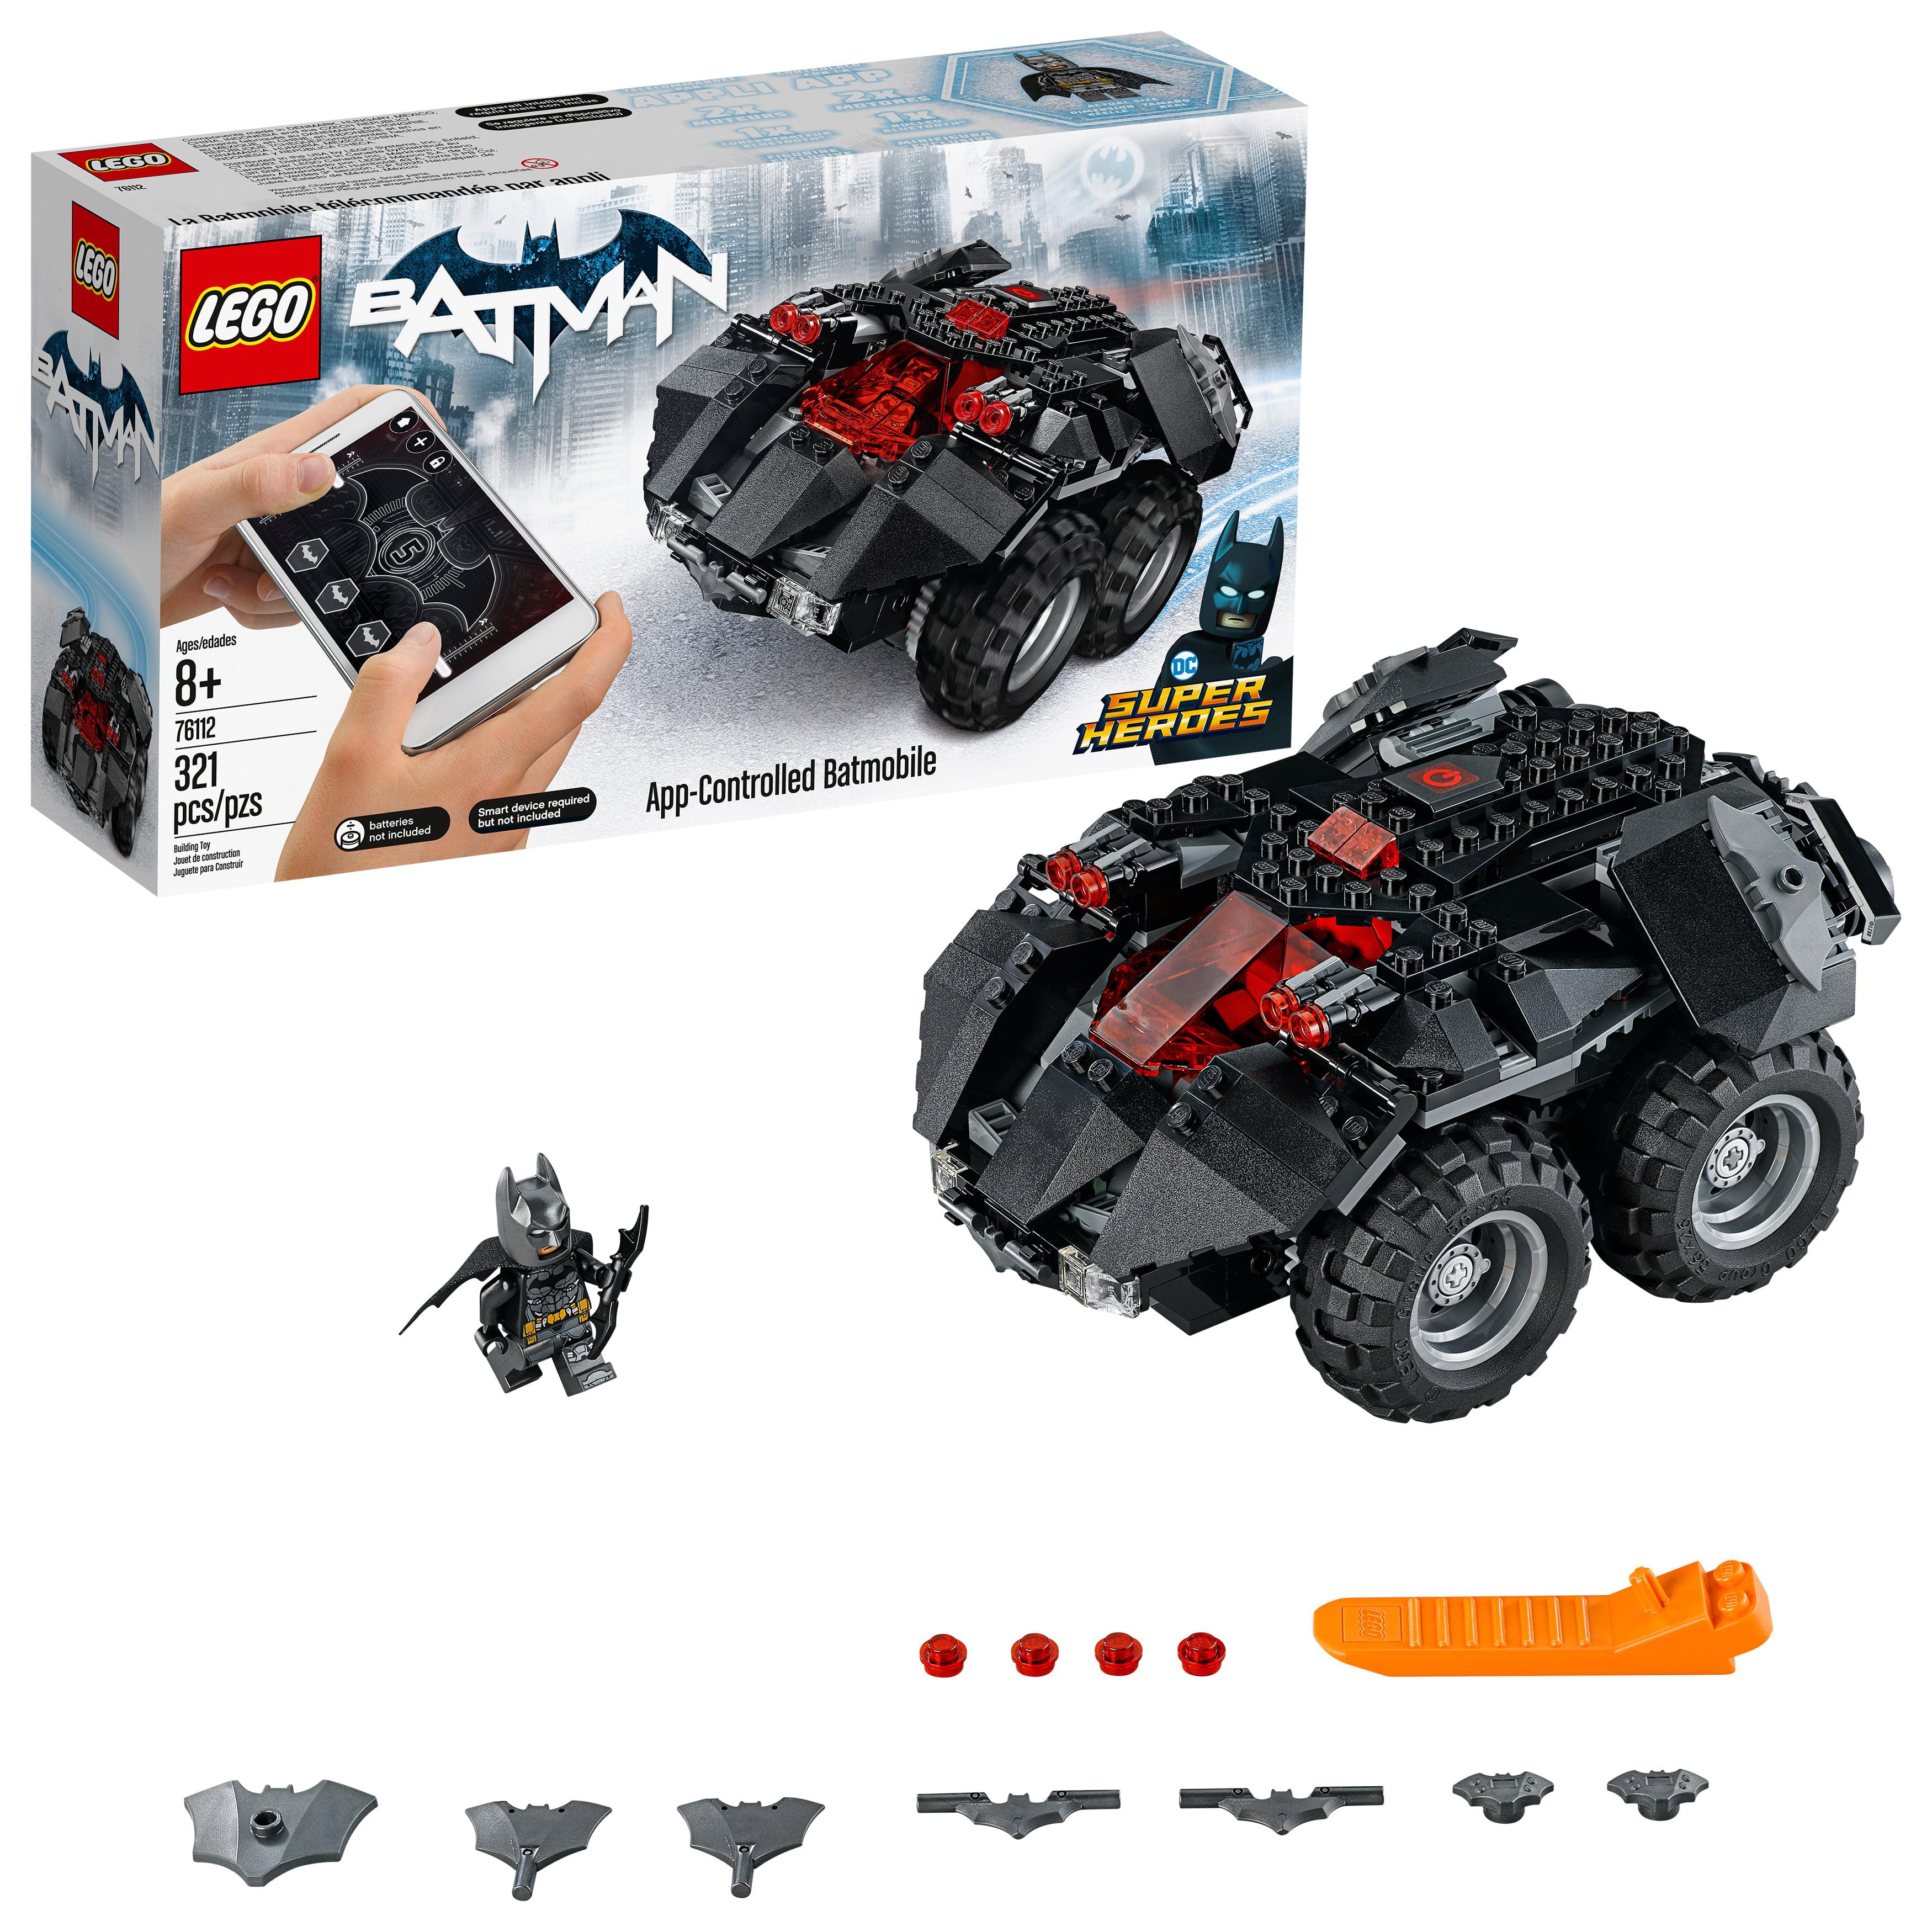 Lego Dc Super Heroes App Controlled Batmobile 76112 Remote Control